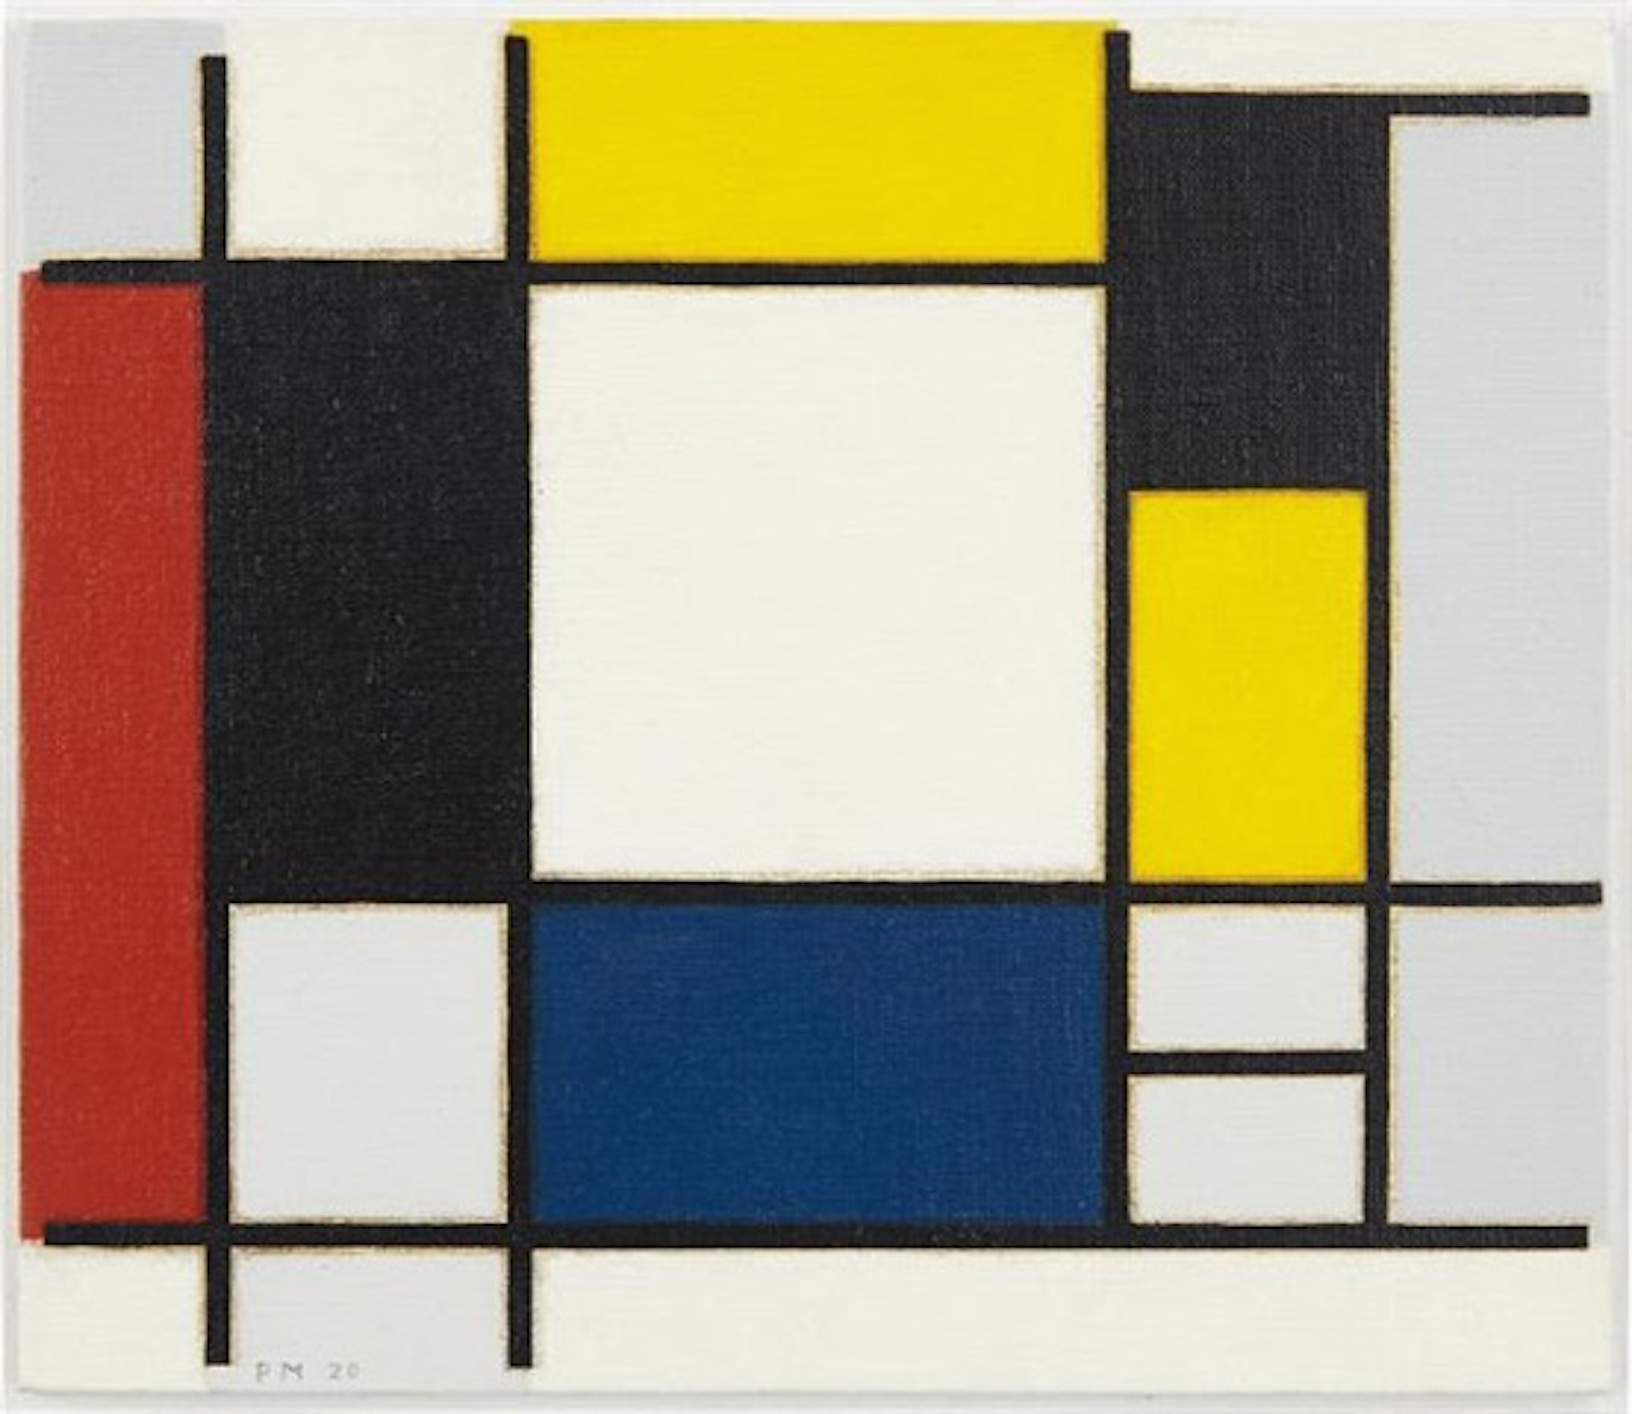 Mondrain Composition by Richard Pettibone